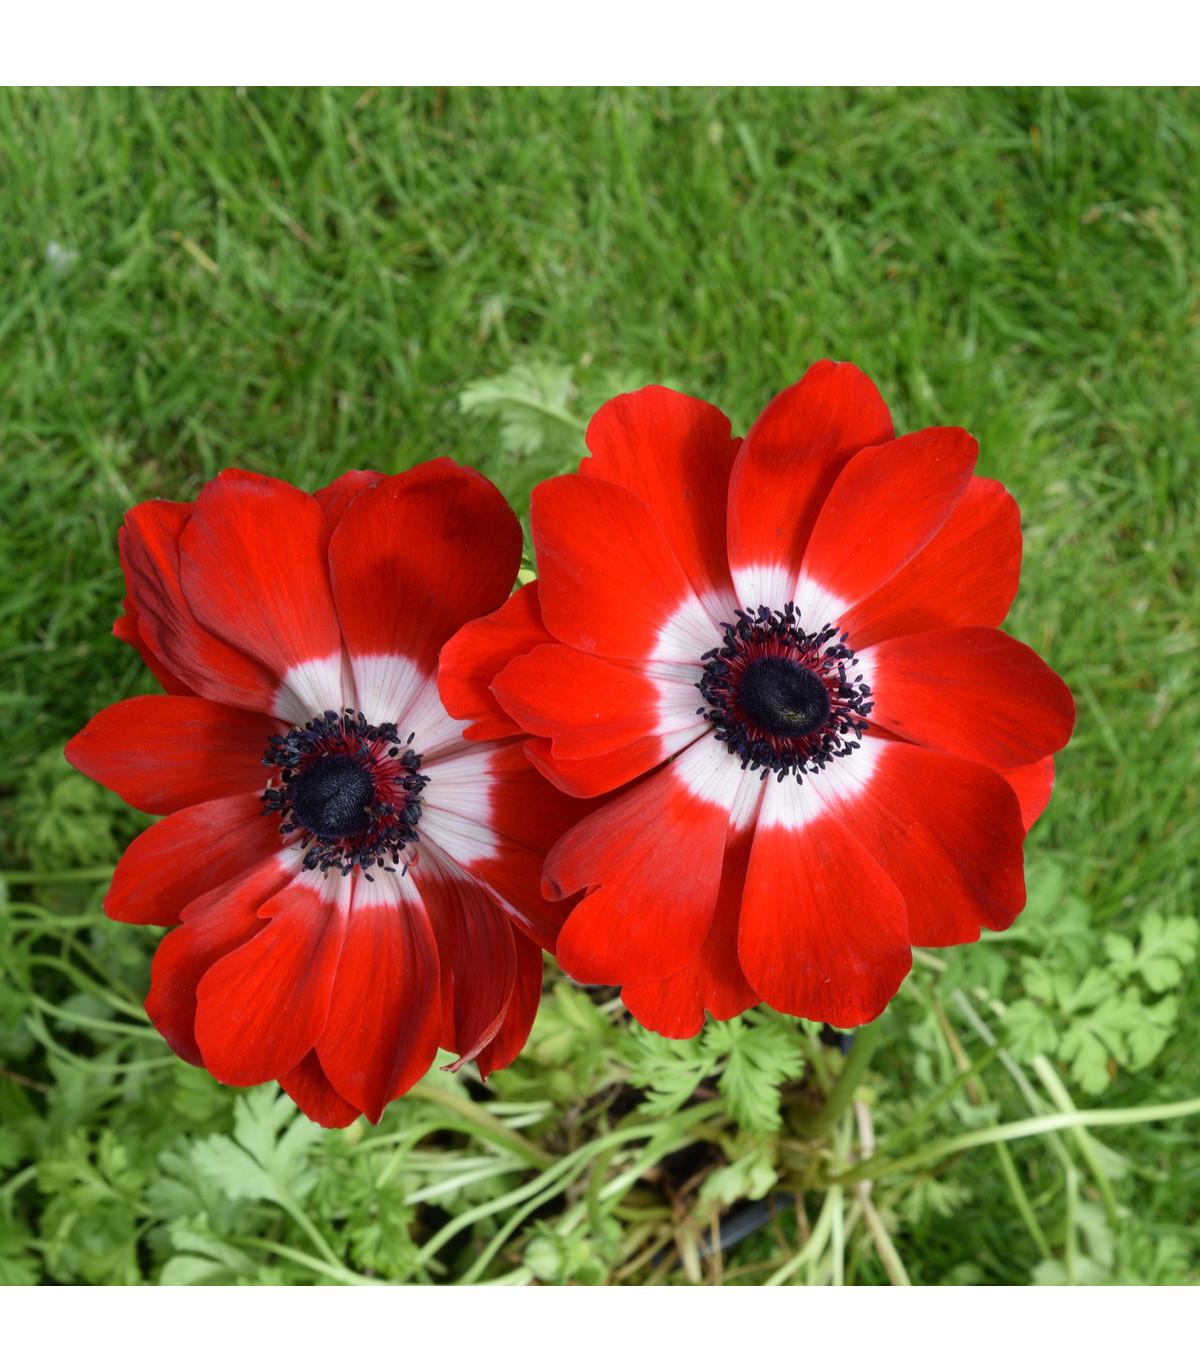 Sasanka Hollandia - Anemone - hlízy sasanek - 3 ks